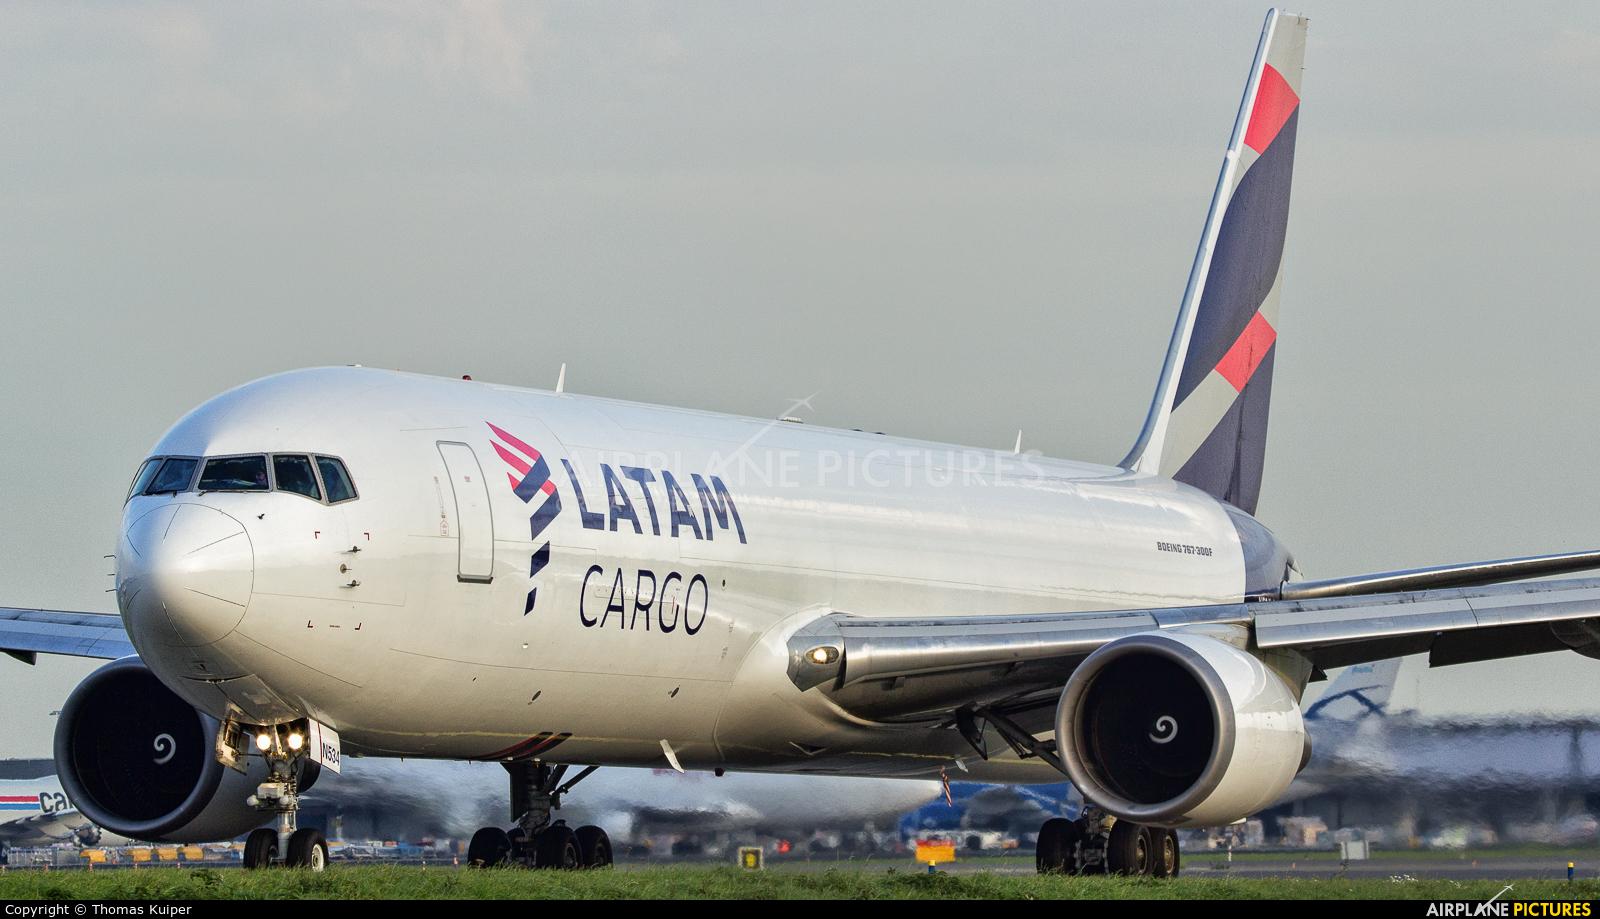 LATAM Cargo N534LA aircraft at Amsterdam - Schiphol